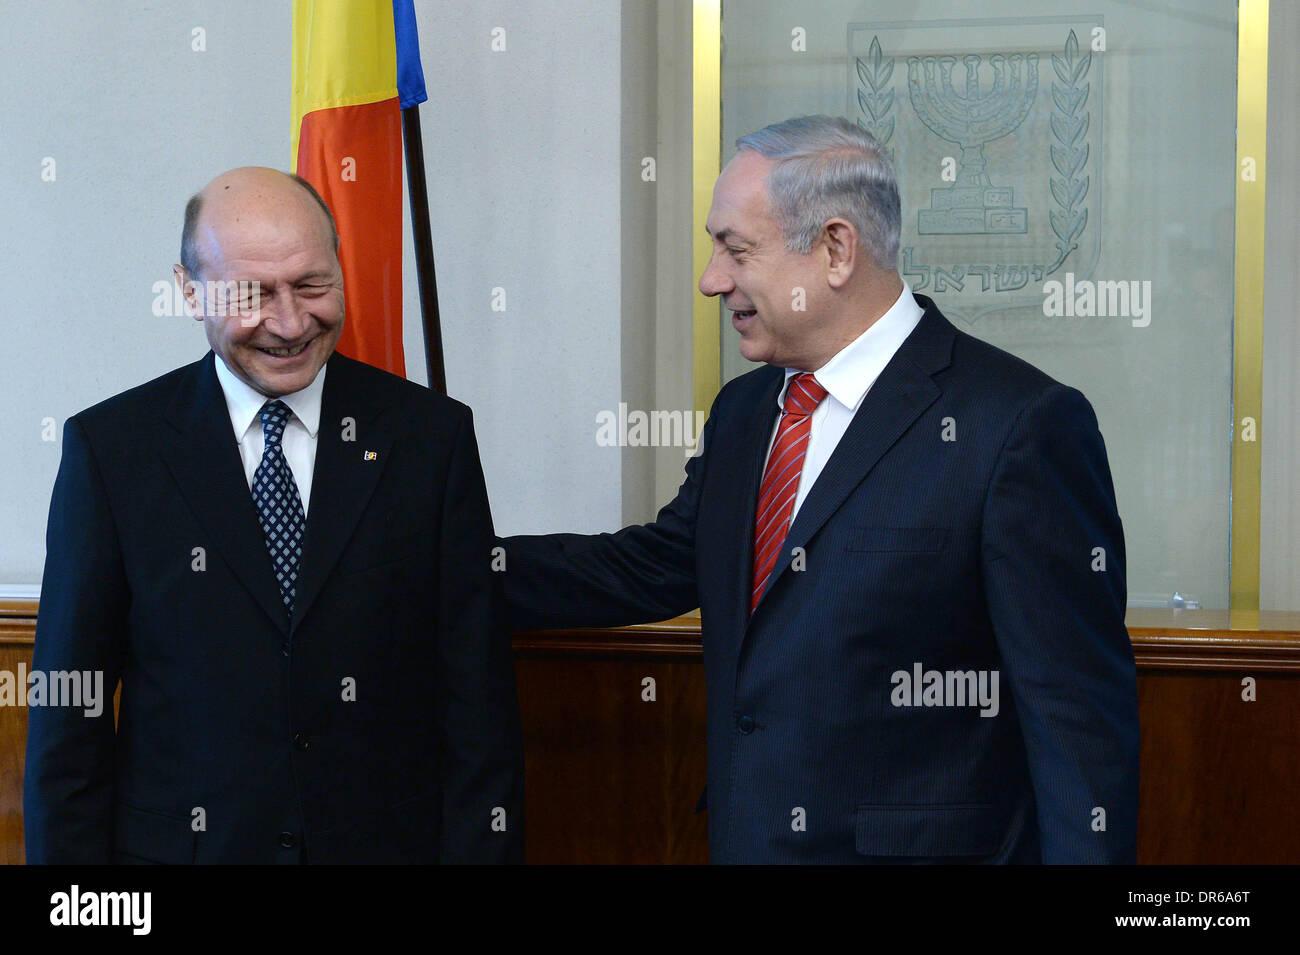 Jerusalem. 20th Jan, 2014. Israeli Prime Minister Benjamin Netanyahu (R) meets with visiting Romanian President Traian Basescu in Jerusalem, on Jan. 20, 2014. © GPO/Kobi Gideon/Xinhua/Alamy Live News - Stock Image